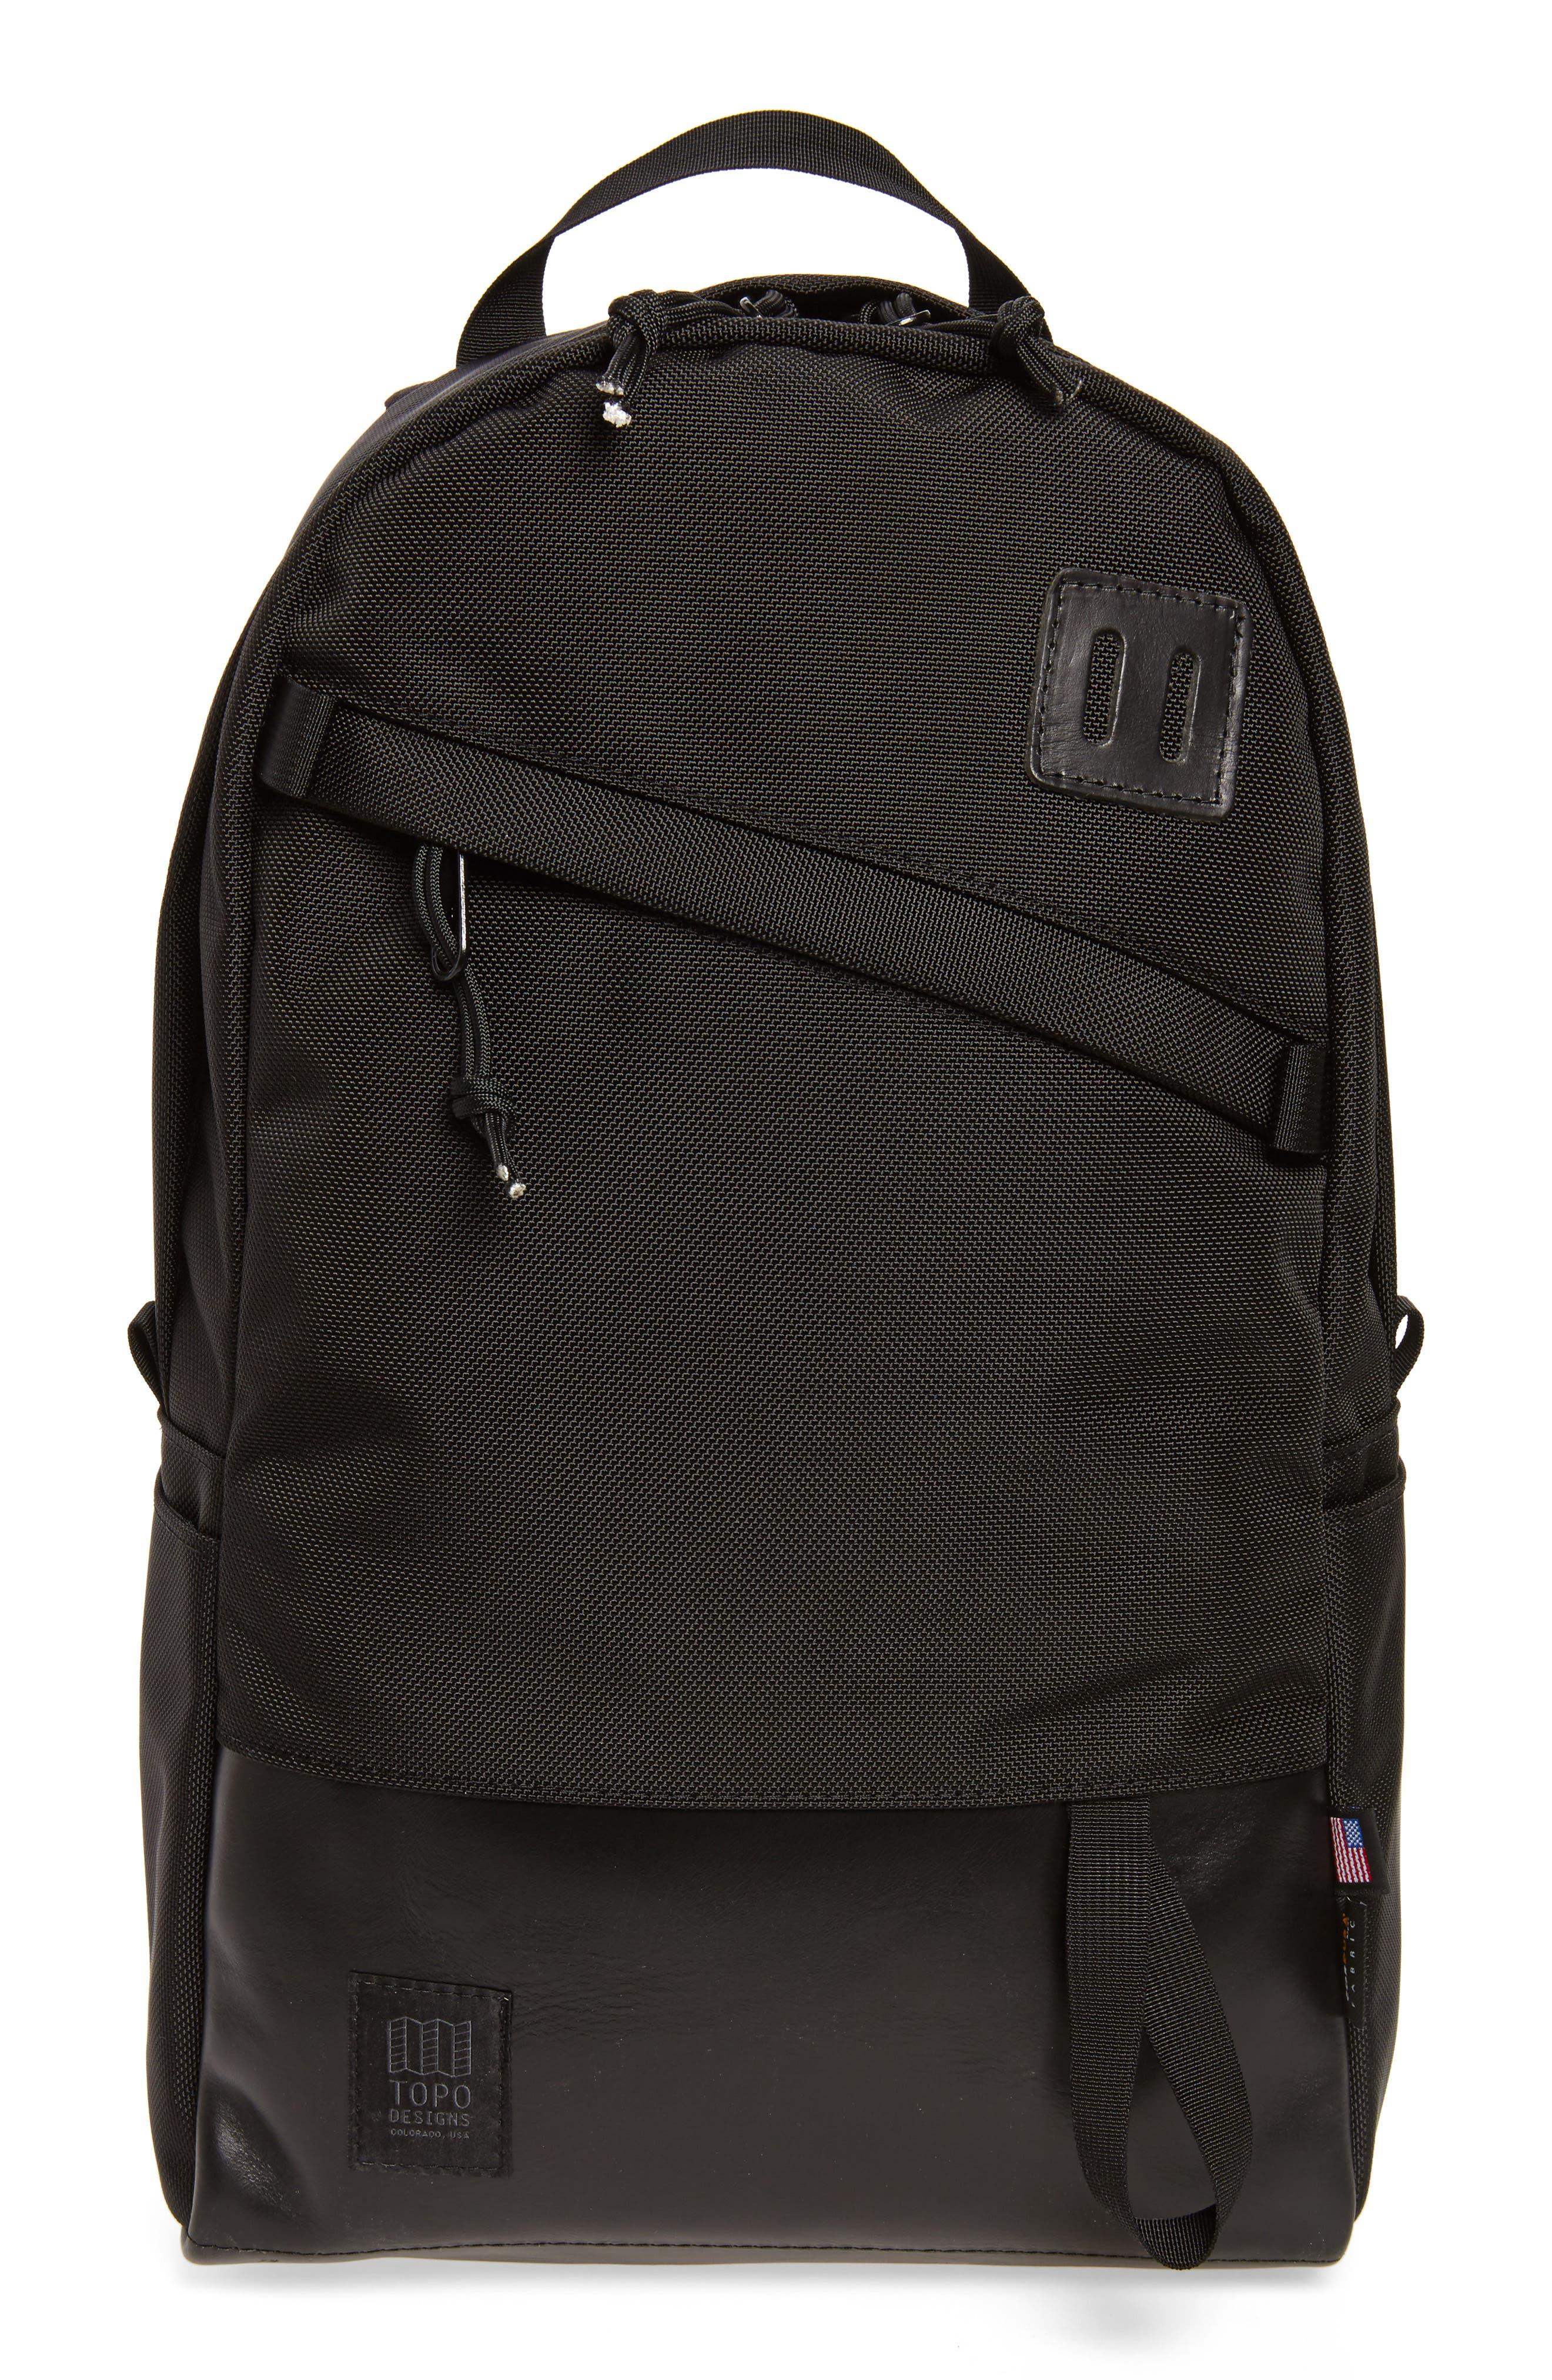 Top Designs Daypack